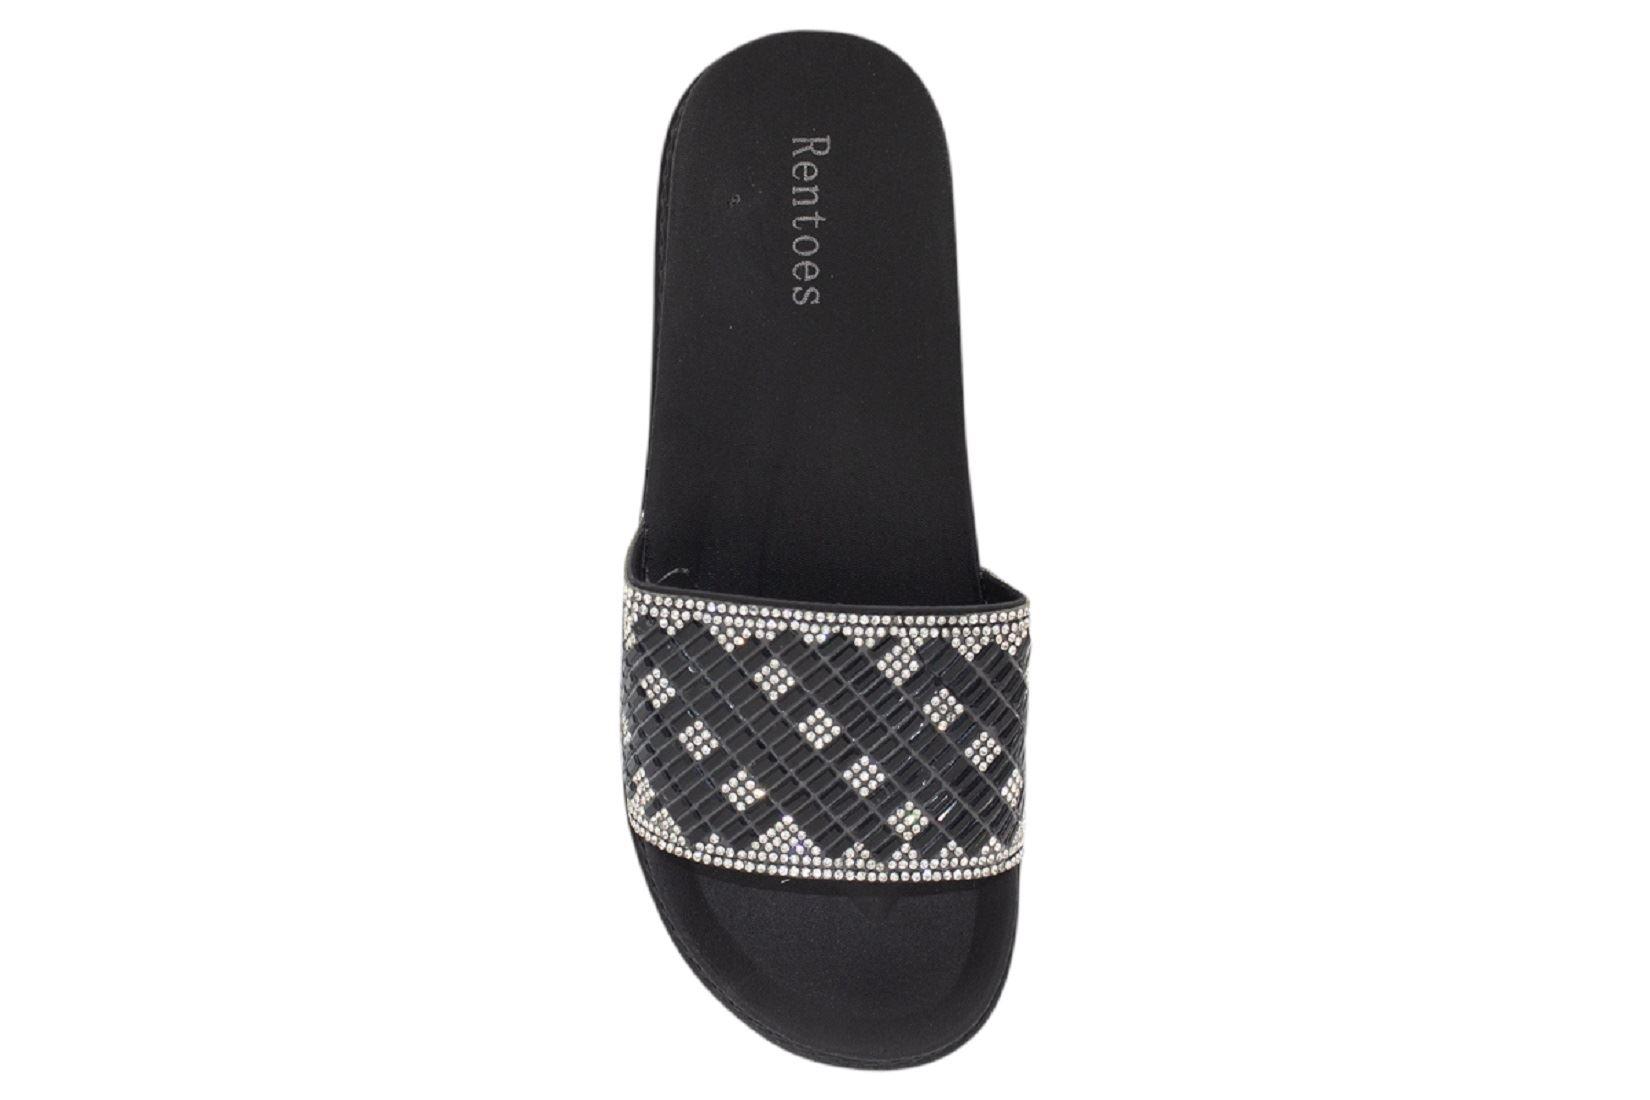 Womens-Sliders-Casual-Slippers-Mules-Ladies-Diamante-Flip-Flop-Sandals-Shoes thumbnail 39